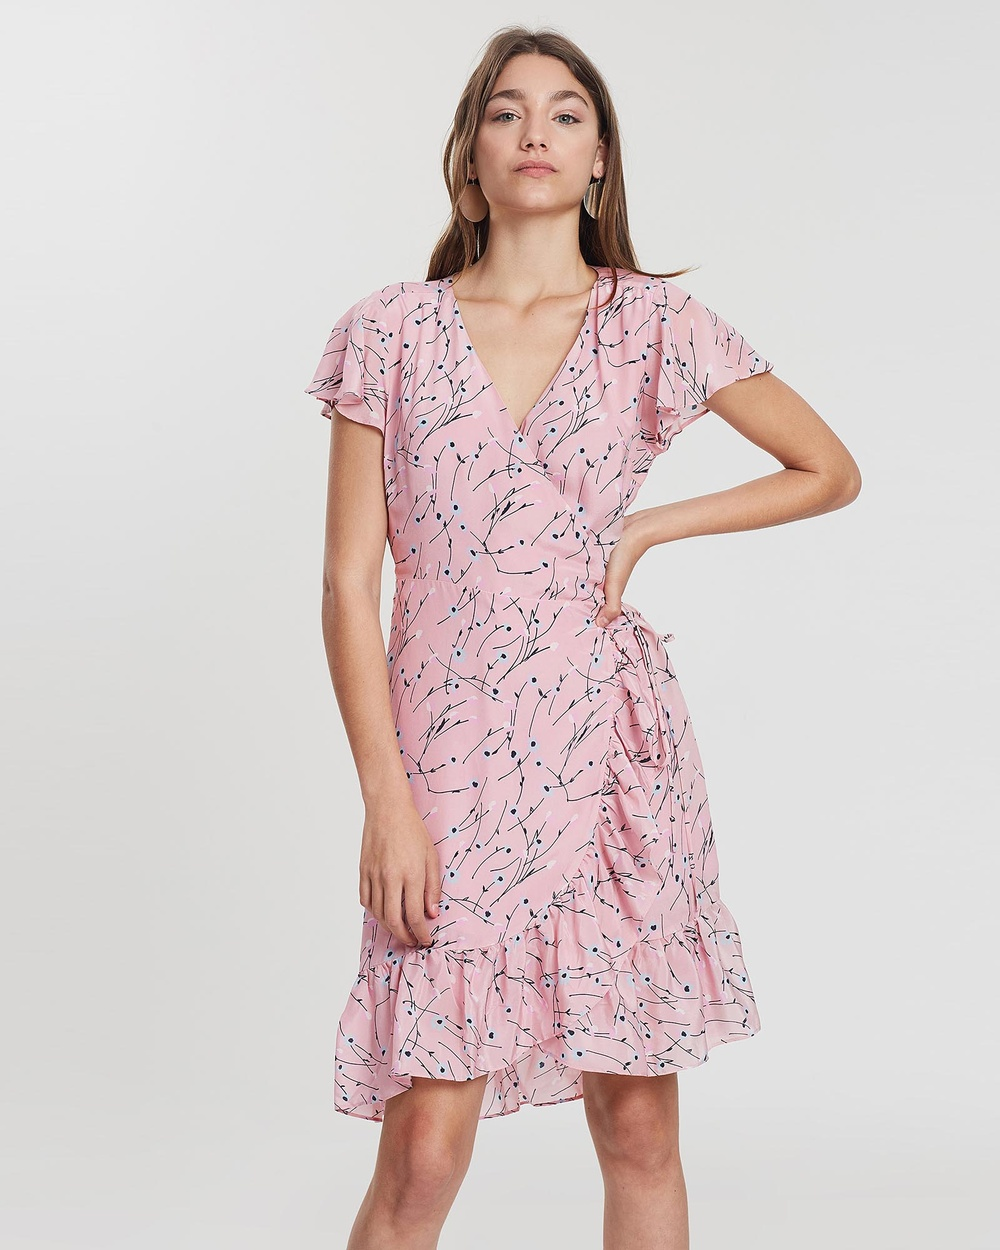 Ella Sanders Pink Daisy Dress